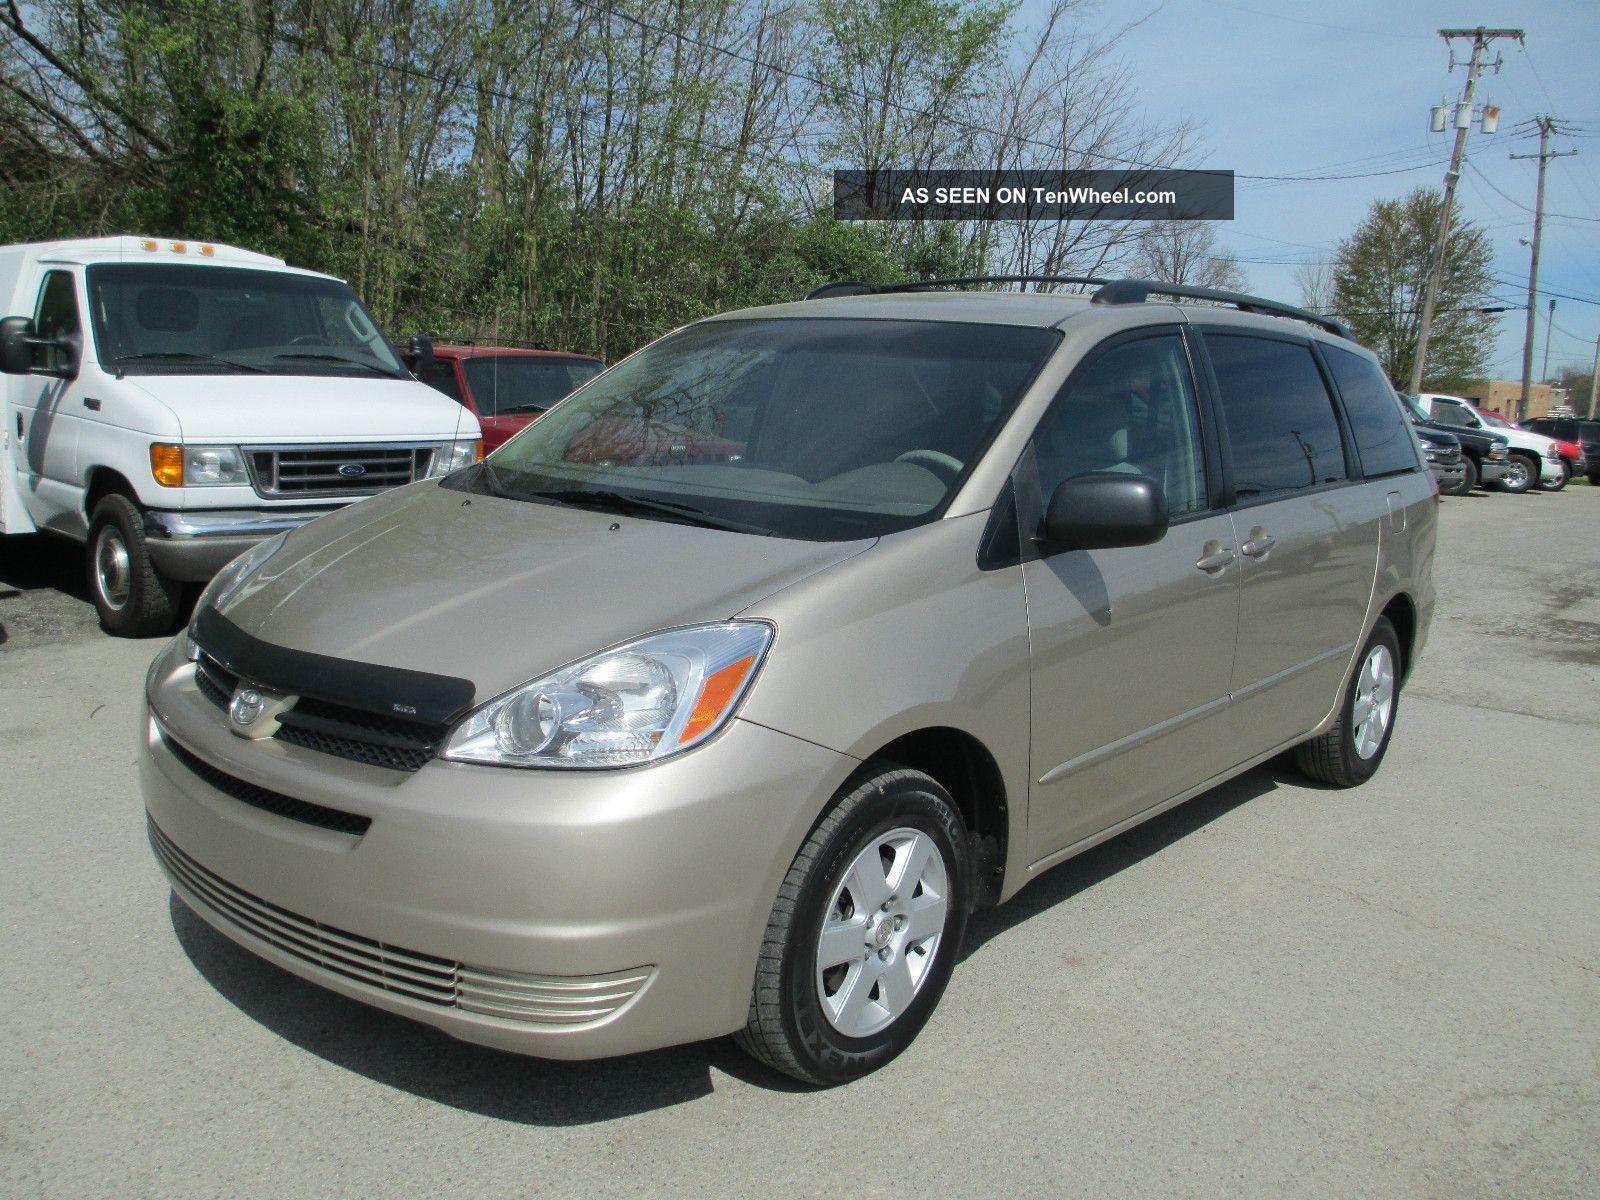 Gas Mileage On Nissan Pathfinder 2008 Kia Sportage LX 4WD besides Hello Every One I Need Nissan Prairie ...